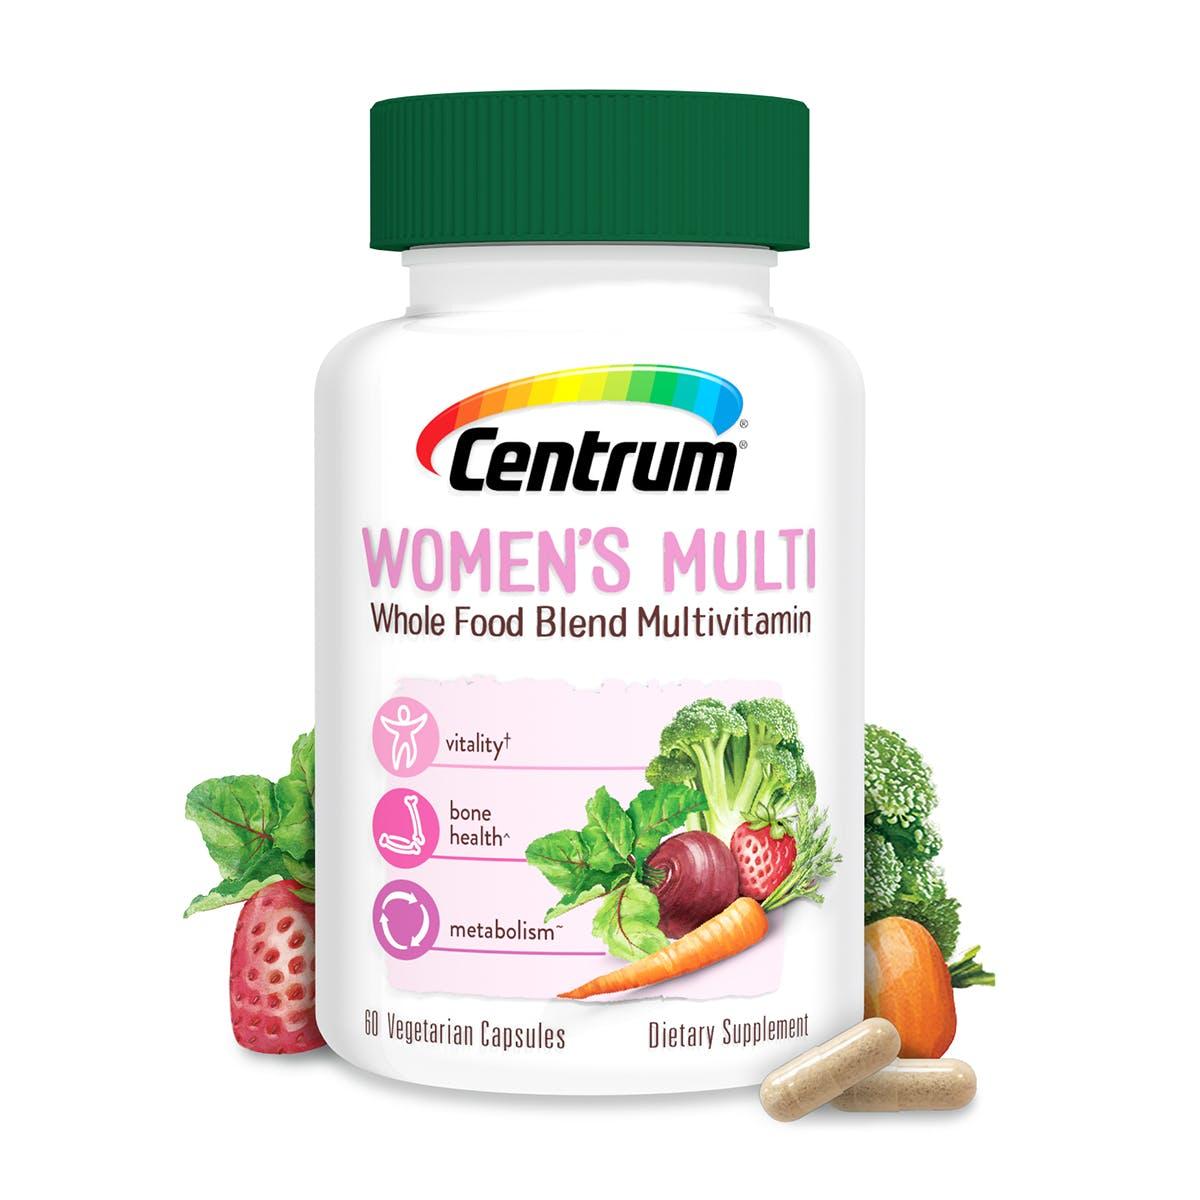 Bottle of Centrum Women's Whole Food Blend Multivitamin